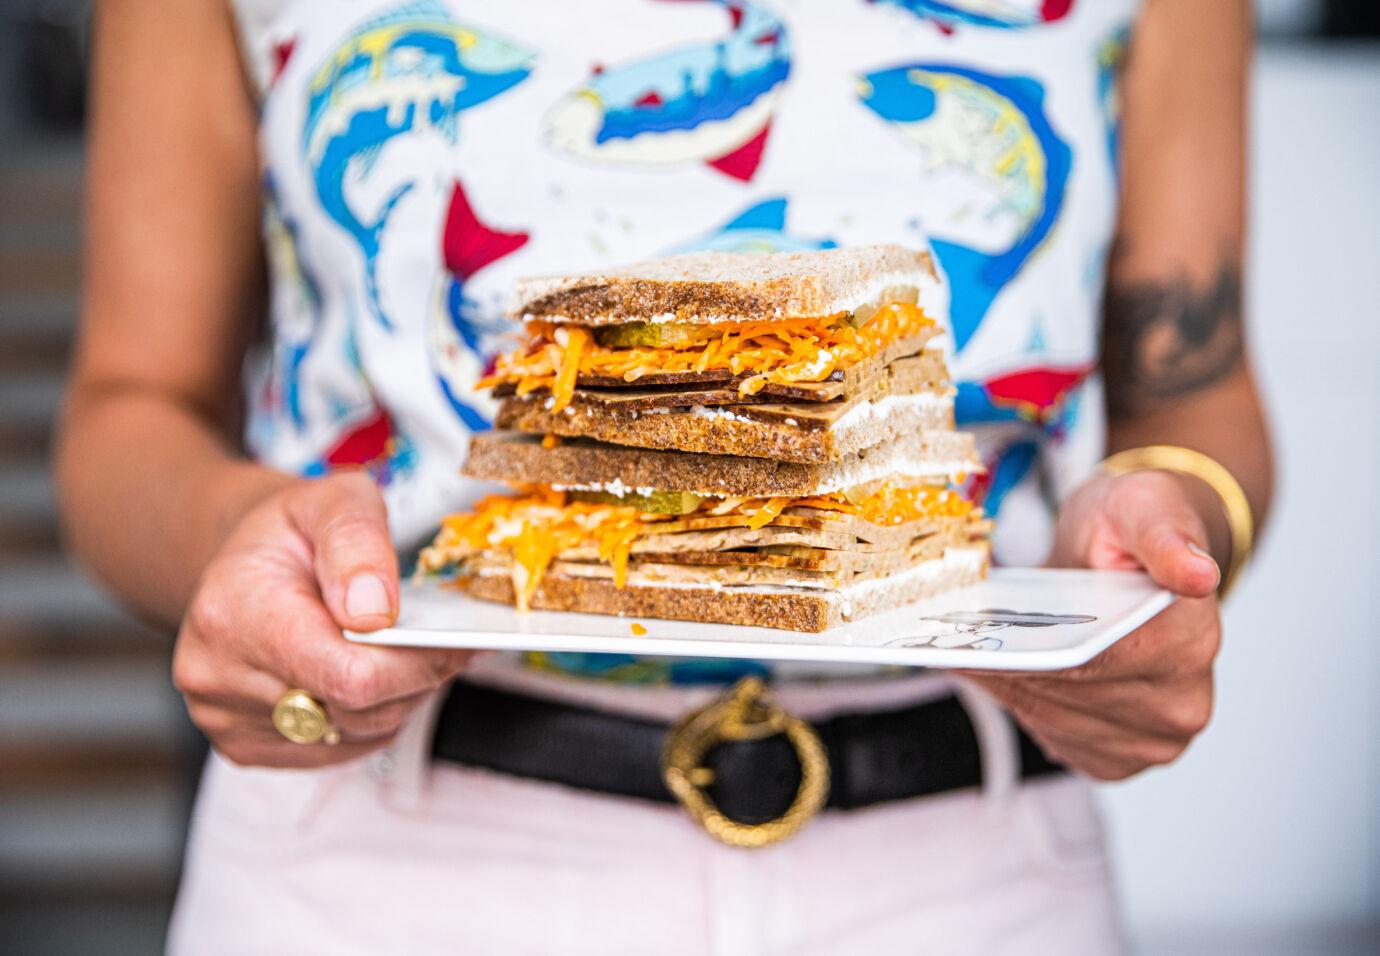 Sandwich-fricandon-met-wortelsla-en-geitenkaas